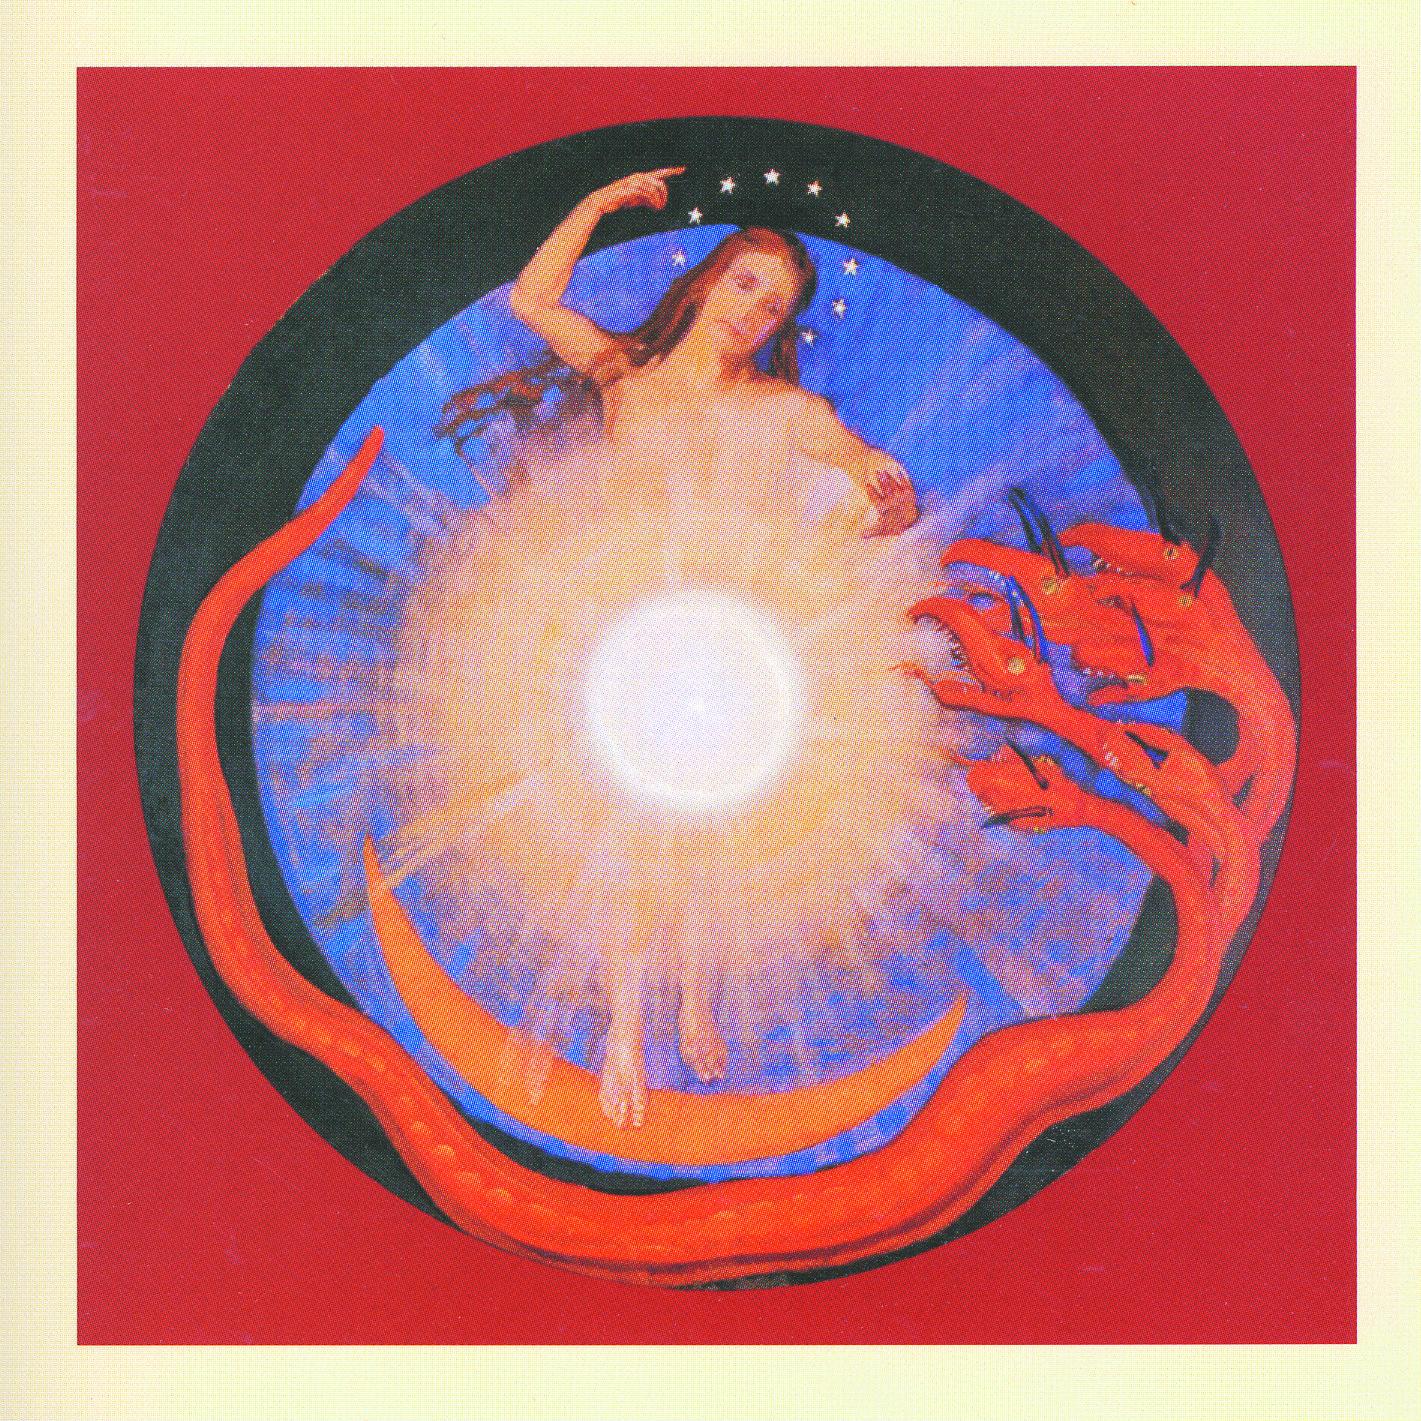 Rudolf Steiner - The Fifth Seal: Anthropos-Sophia | Ancient origins, Rudolf  steiner, Sacred geometry